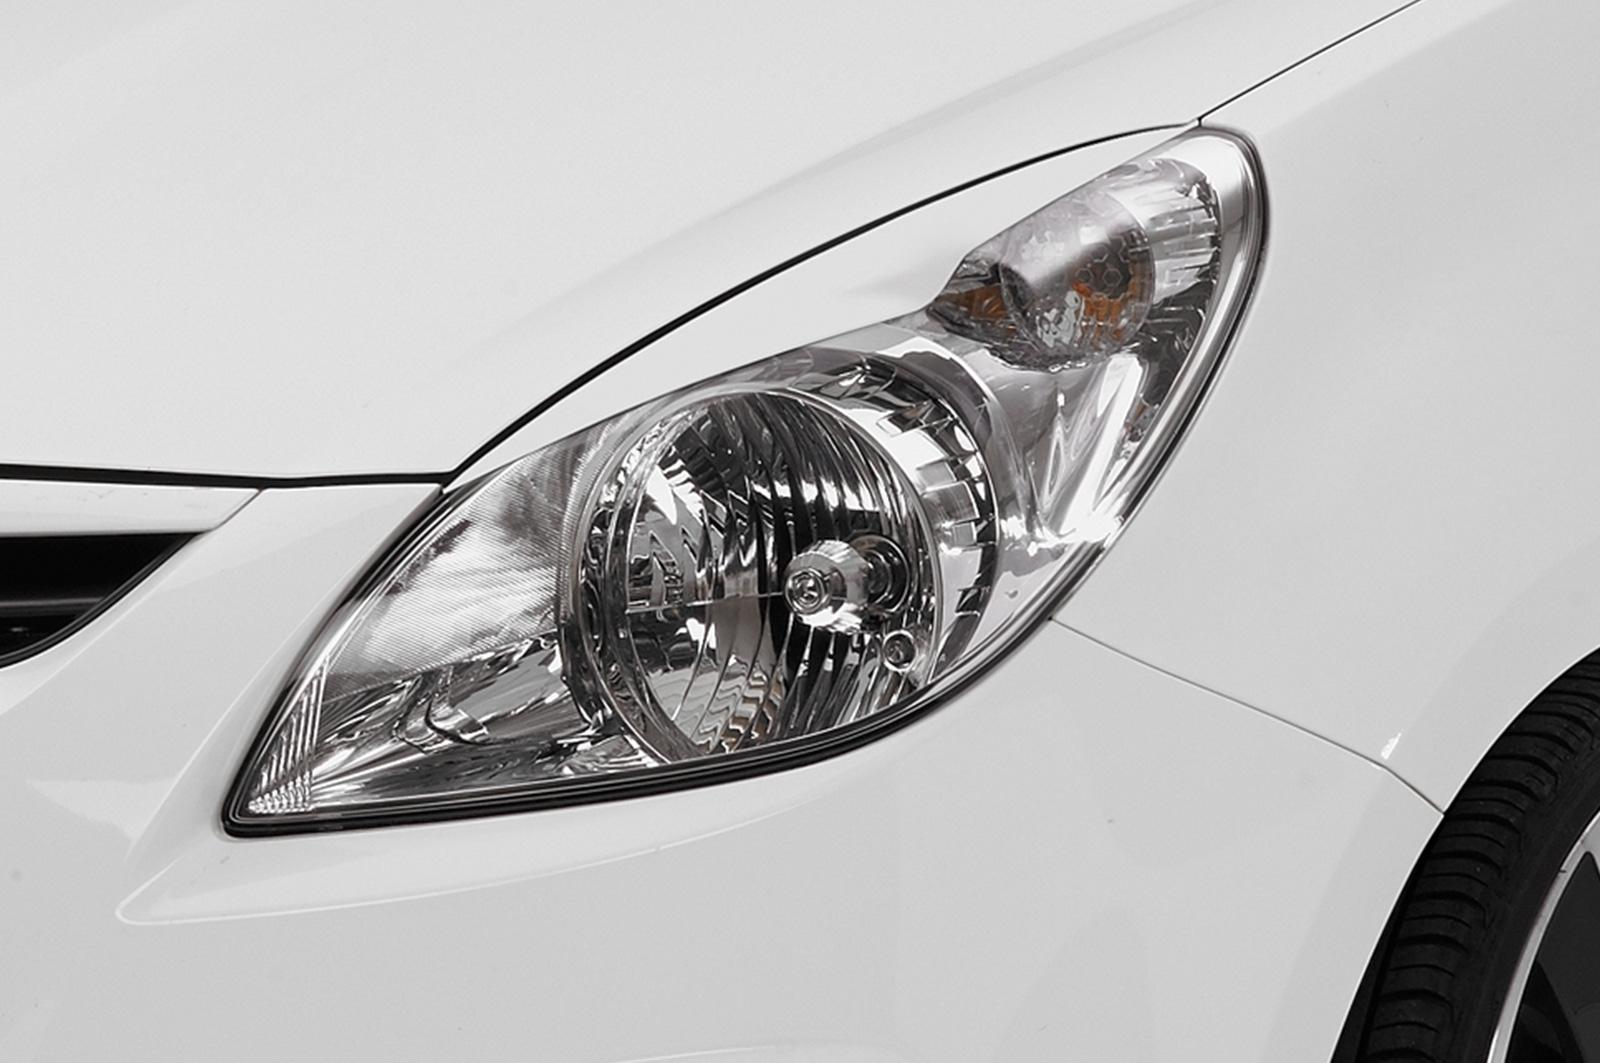 Airintakes Spoileraufsatz Flaps für Hyundai I20 GB AI020